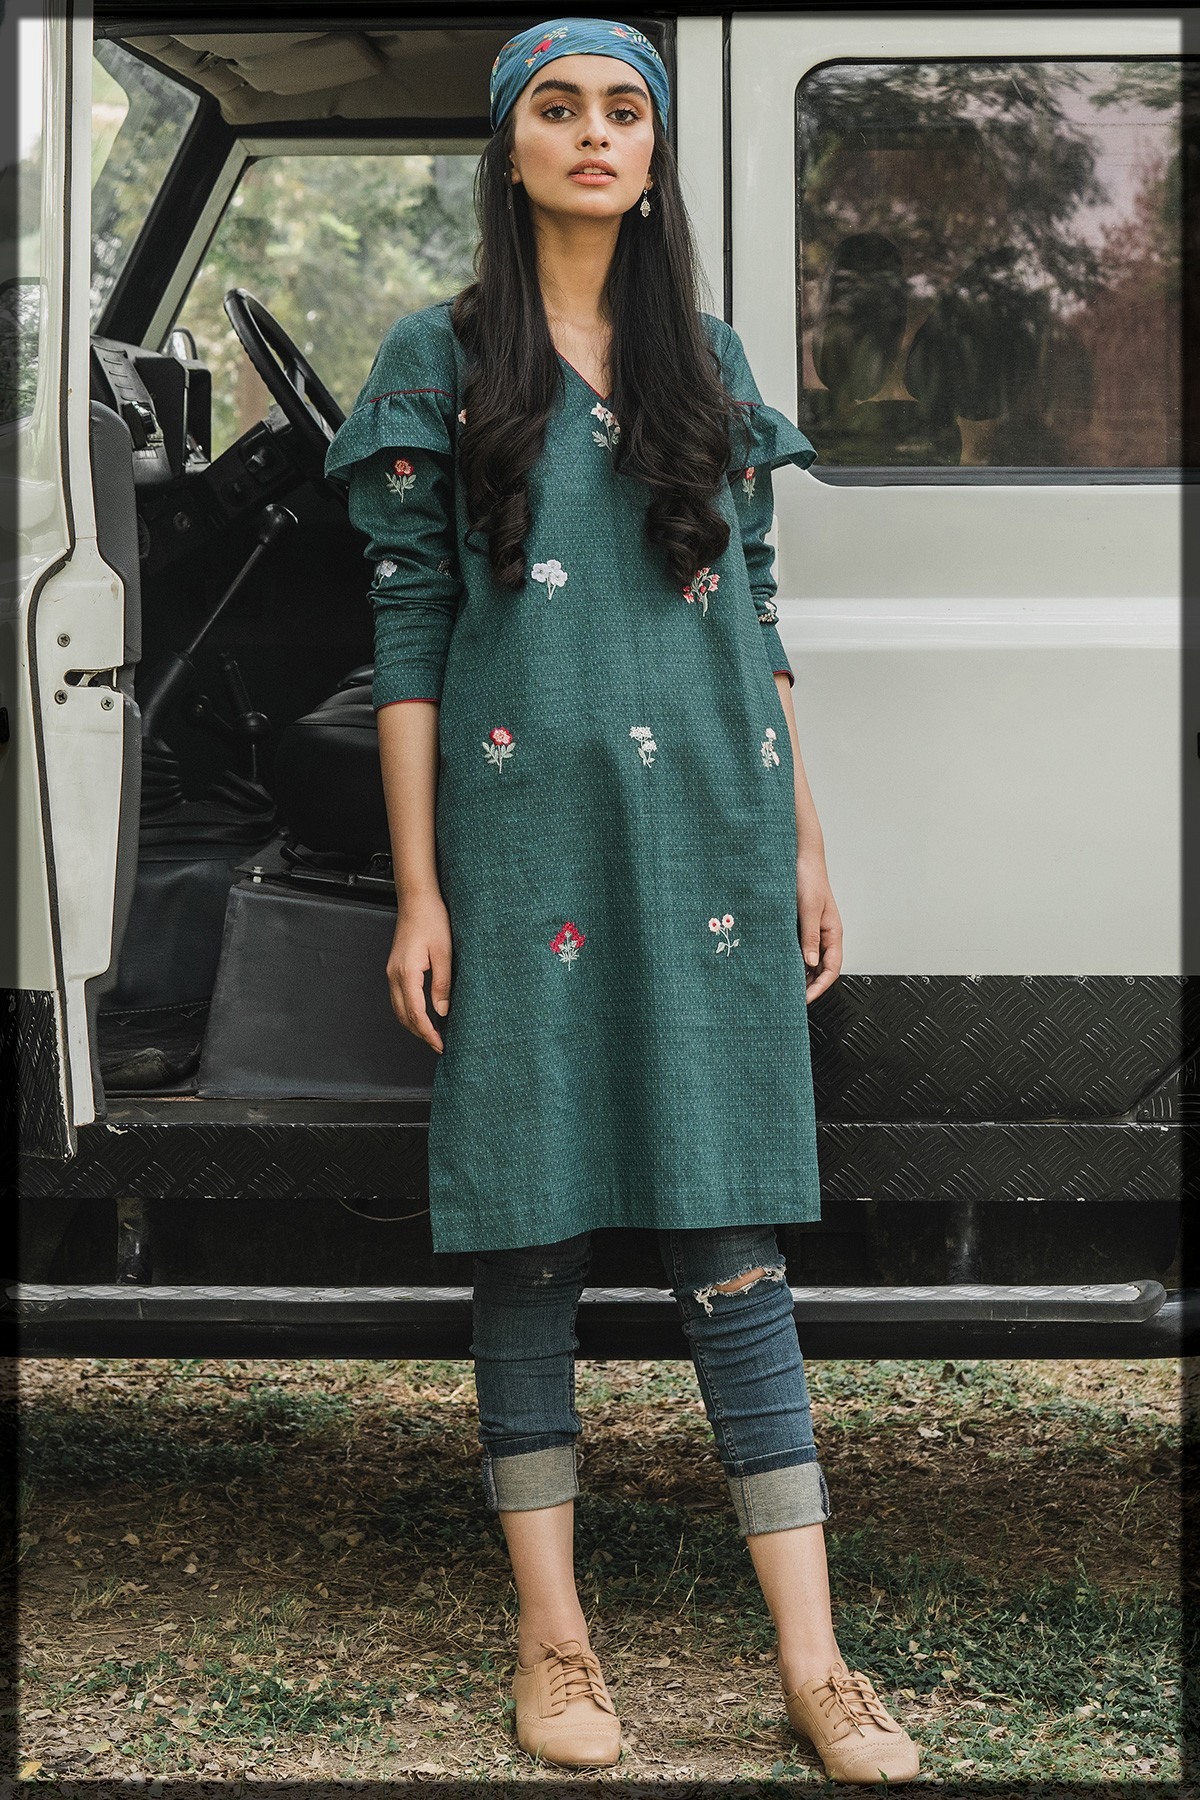 khaddar winter suit for teens